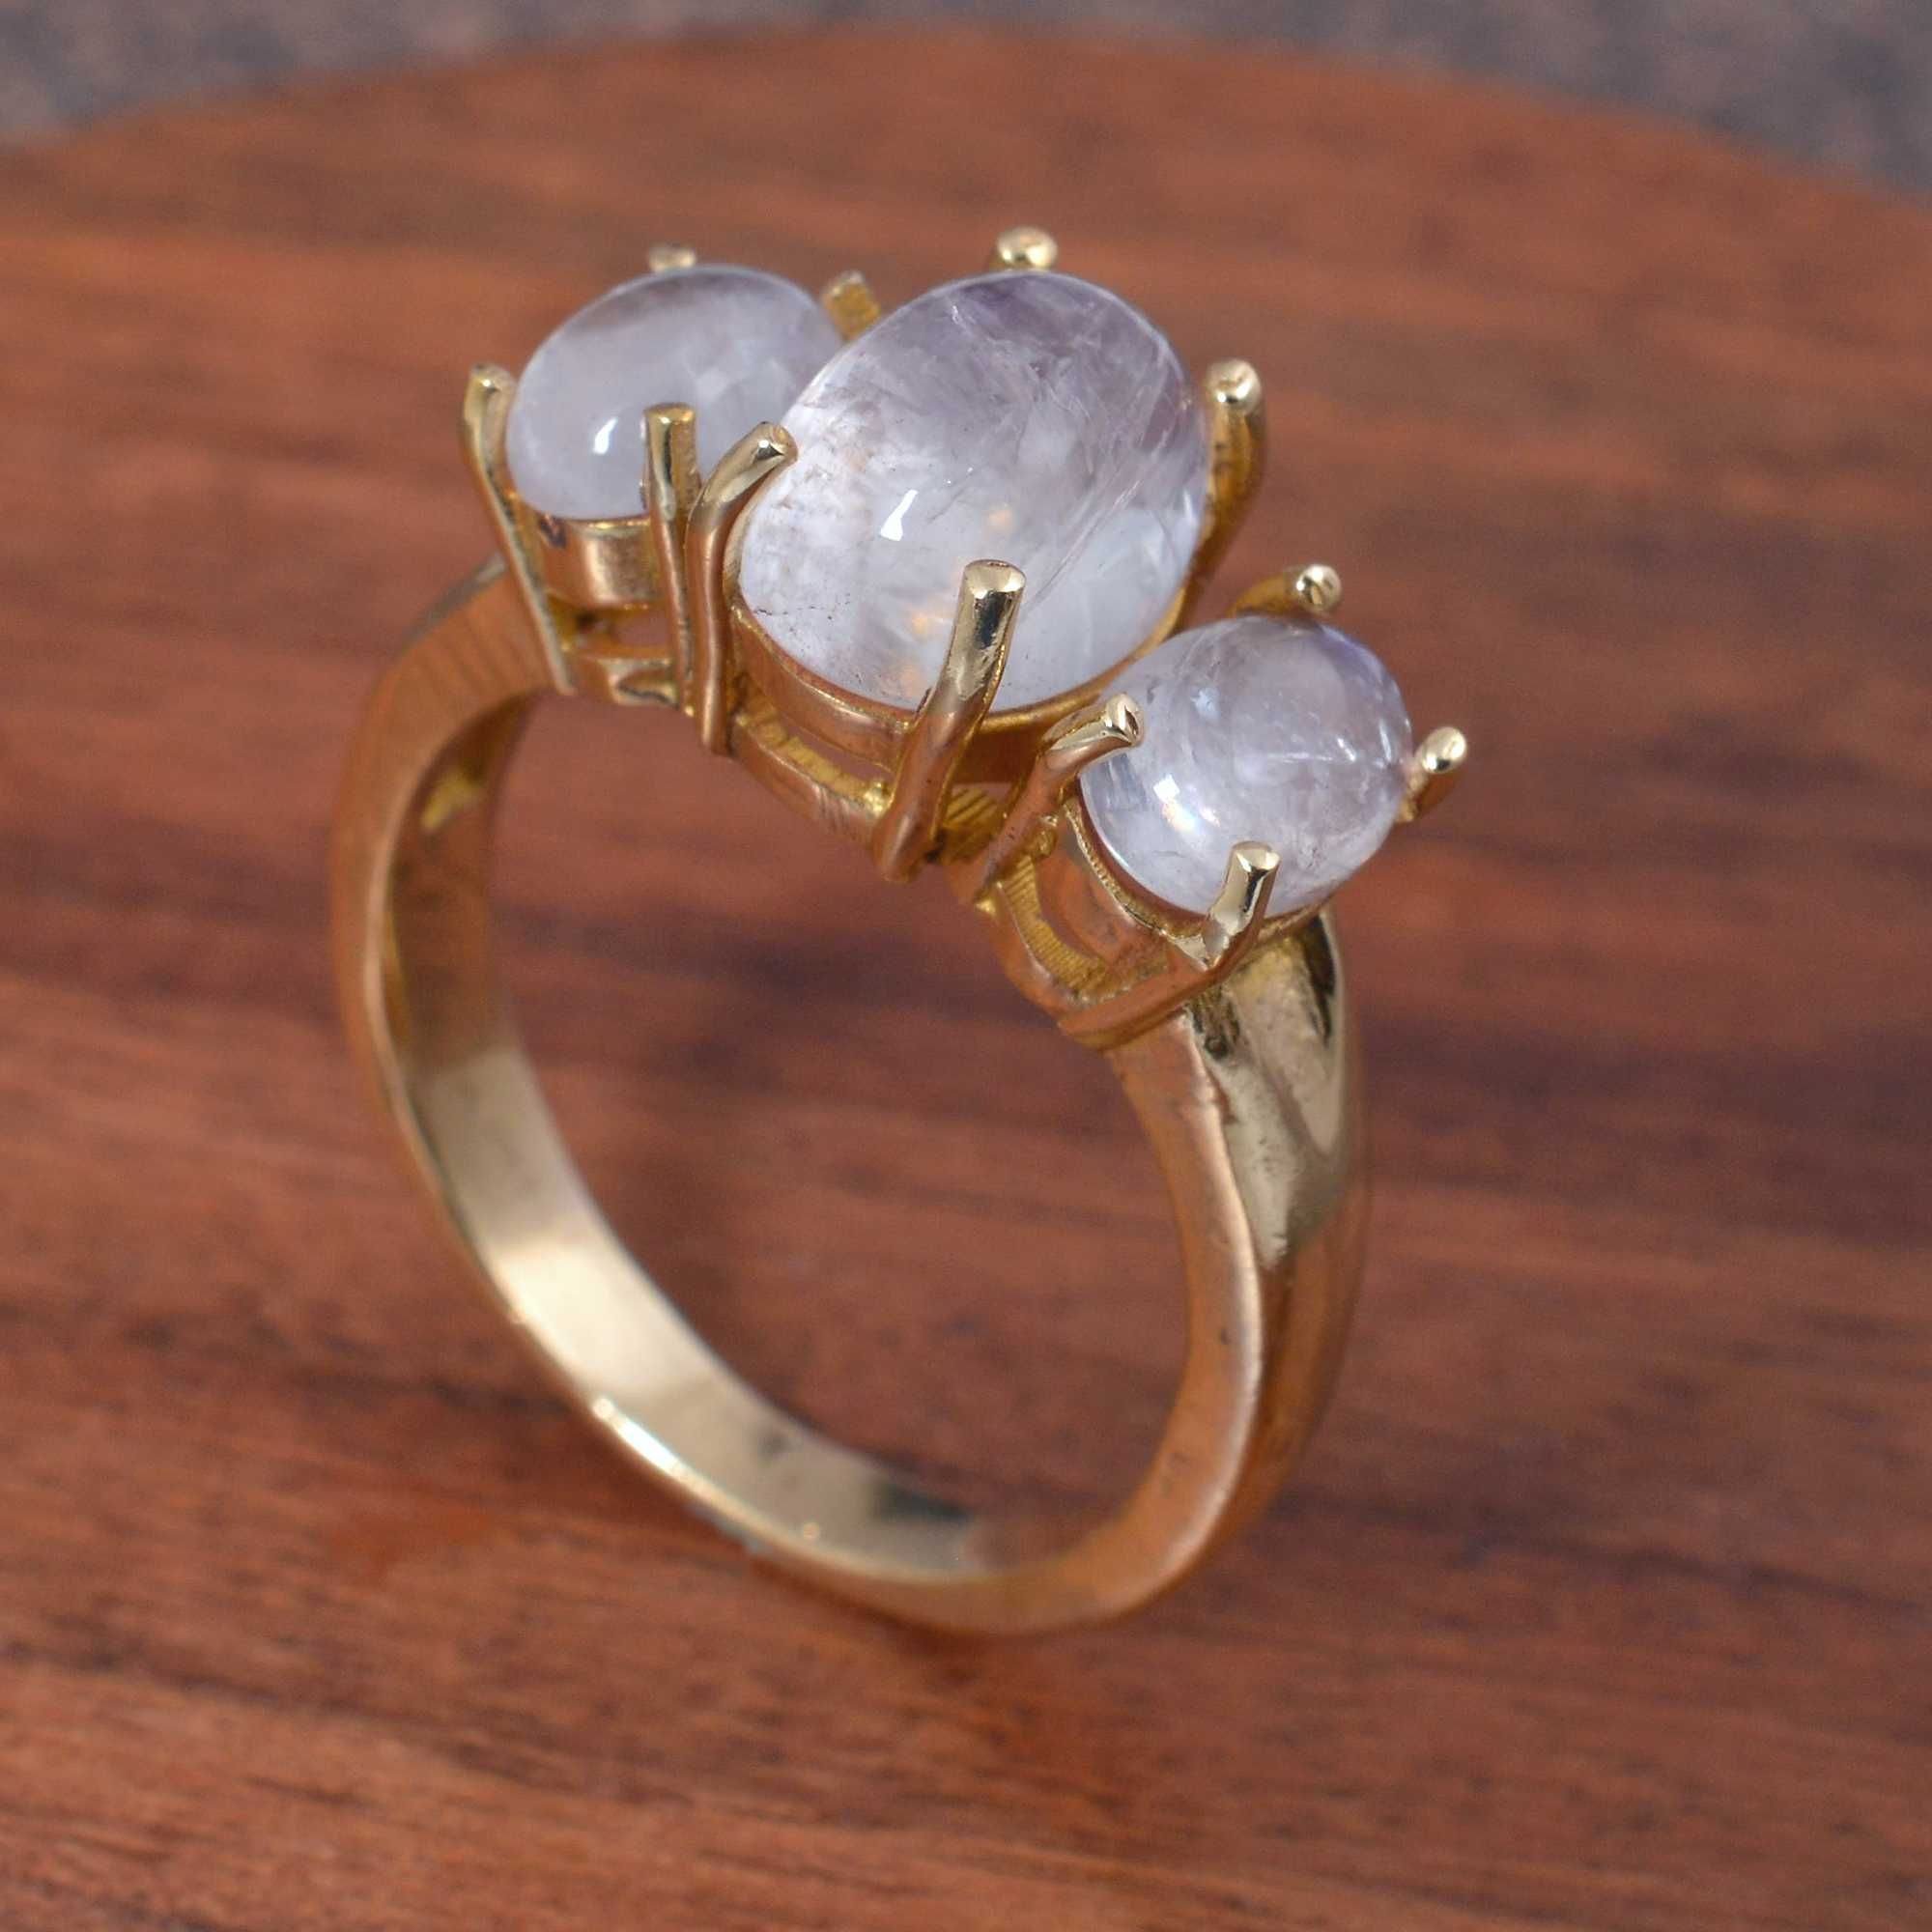 Moonstone Ring,Silver Ring,Handmade Ring,Unique Ring,Boho Ring,Anniversary Ring,Wedding Ring,Vintage Ring,Gift Ring,Gift For Her,Women Ring